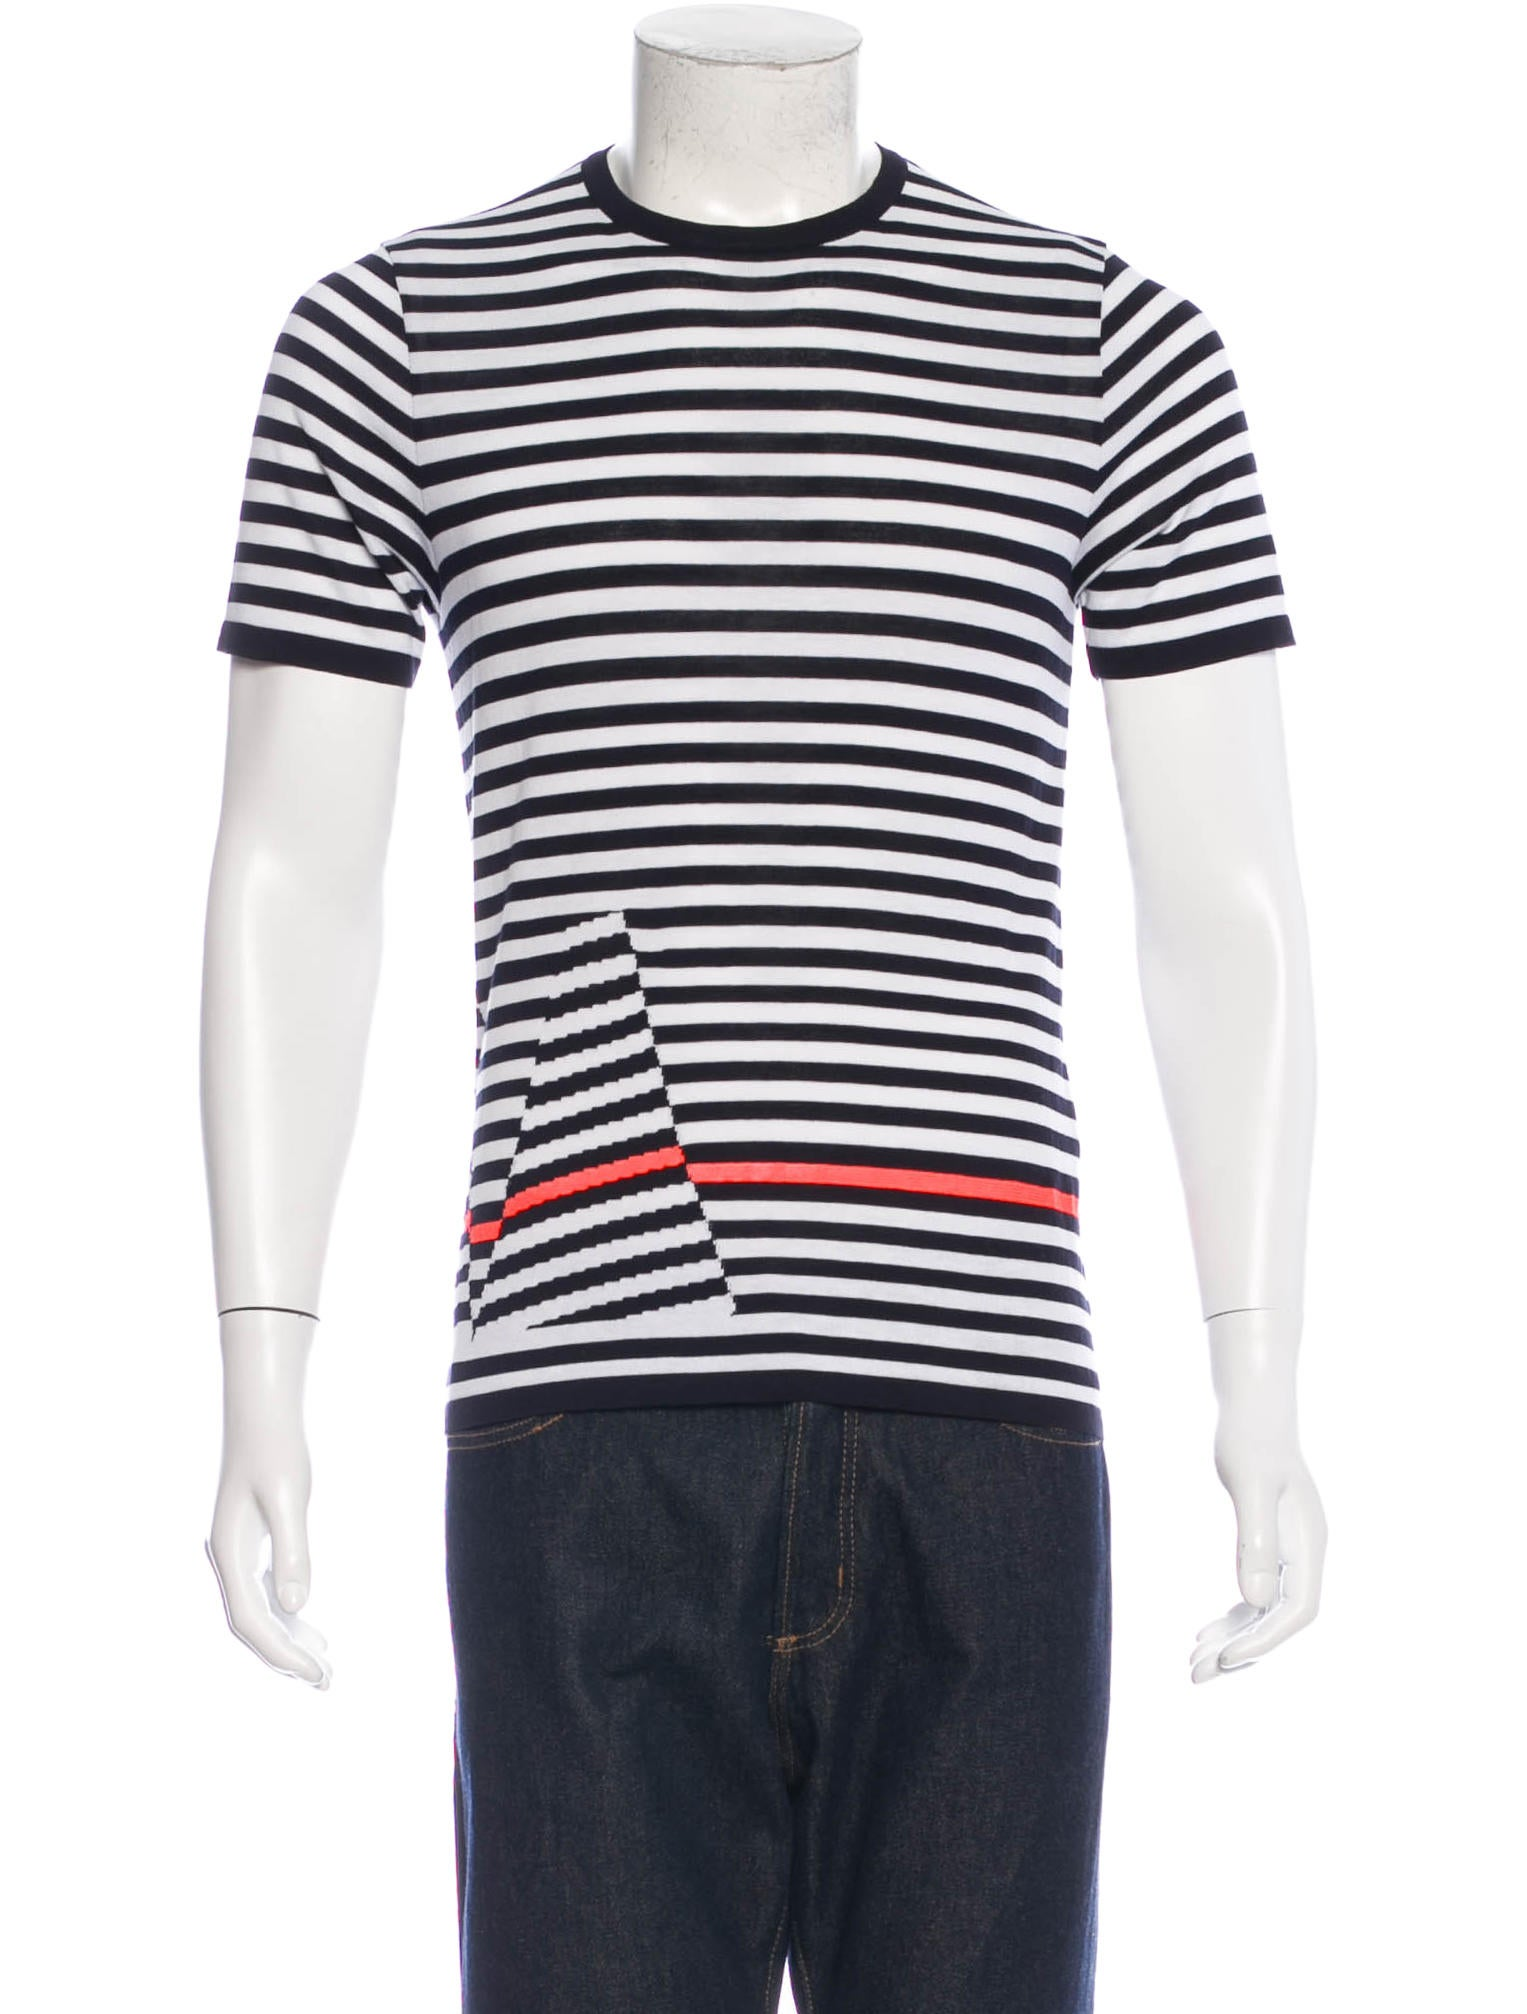 Jil sander striped short sleeve t shirt clothing for Jil sander mens shirt